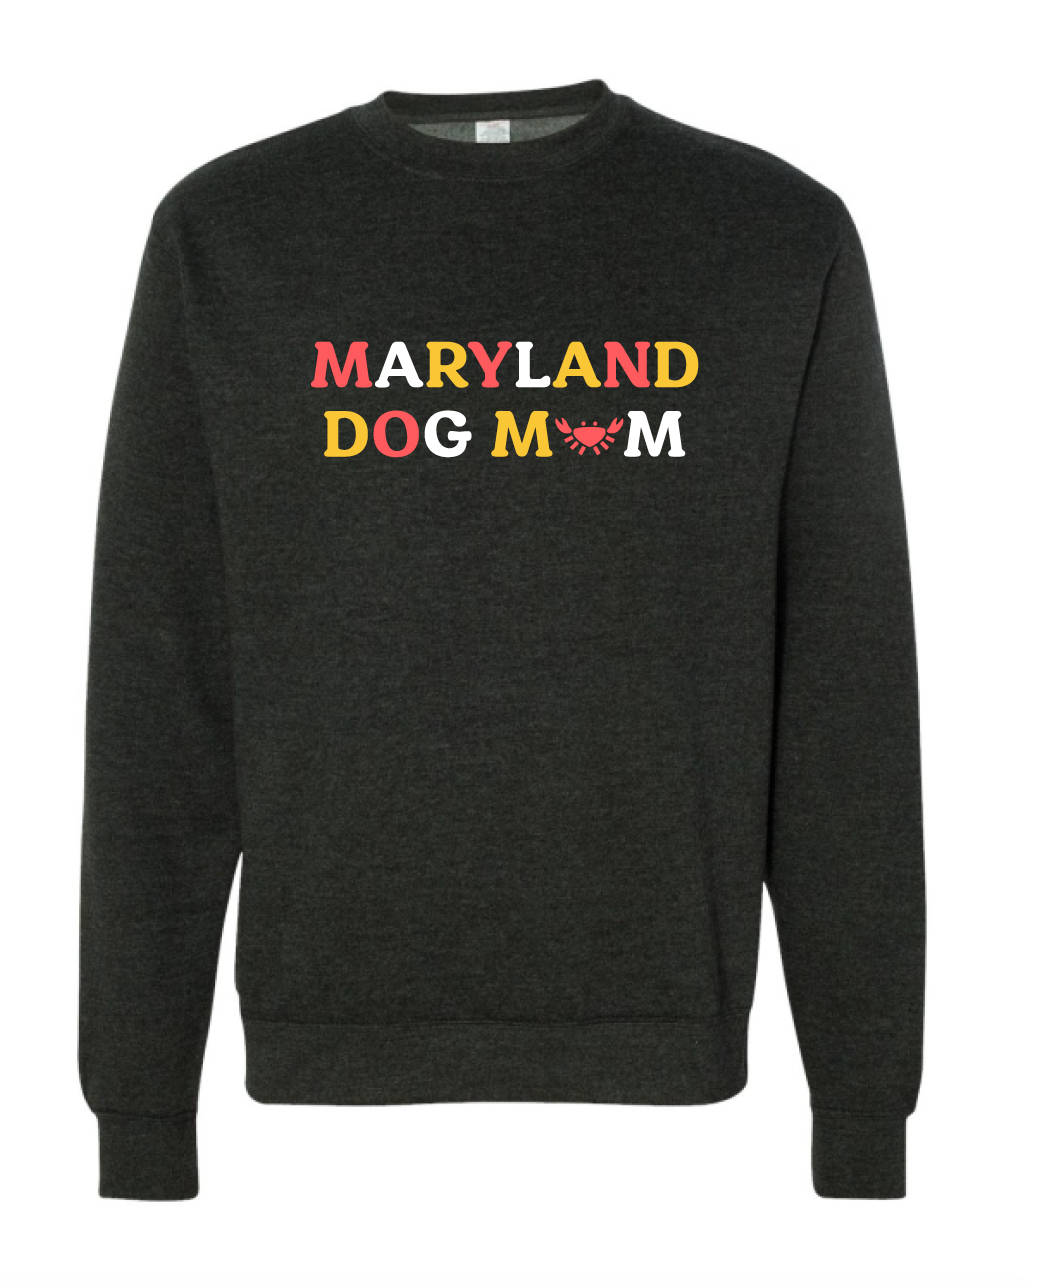 Maryland Dog Mom Crewneck Sweatshirt